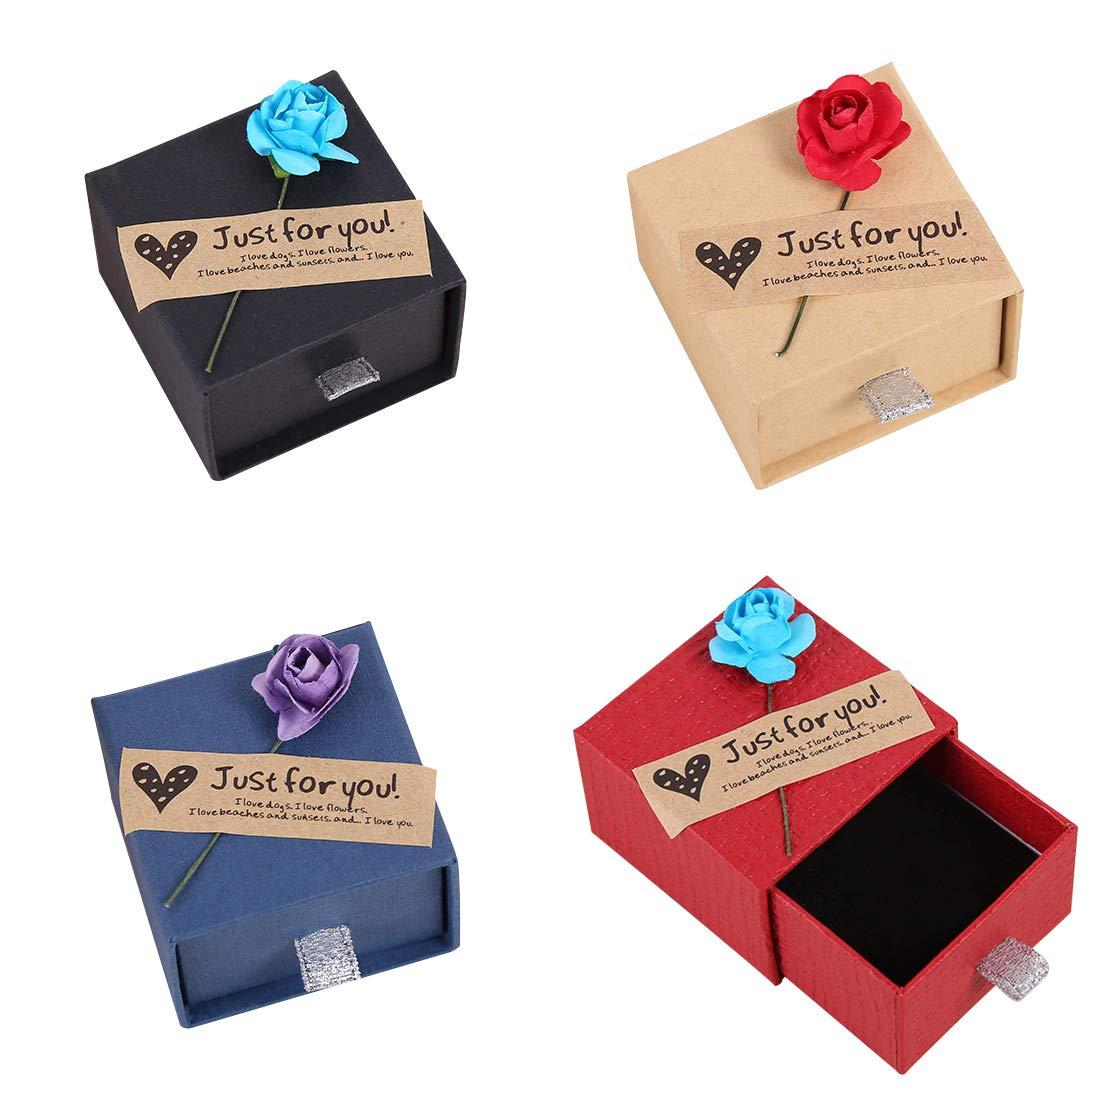 FineInno Jewelry Gift Box Square Shape Present Box Display Rings,Pendants,Necklaces,Earring for Anniversaries, Weddings, Birthdays Birthdays 2x2x1.4inch(5x5x3.5cm) (12 pcs) US-M0168B-CN